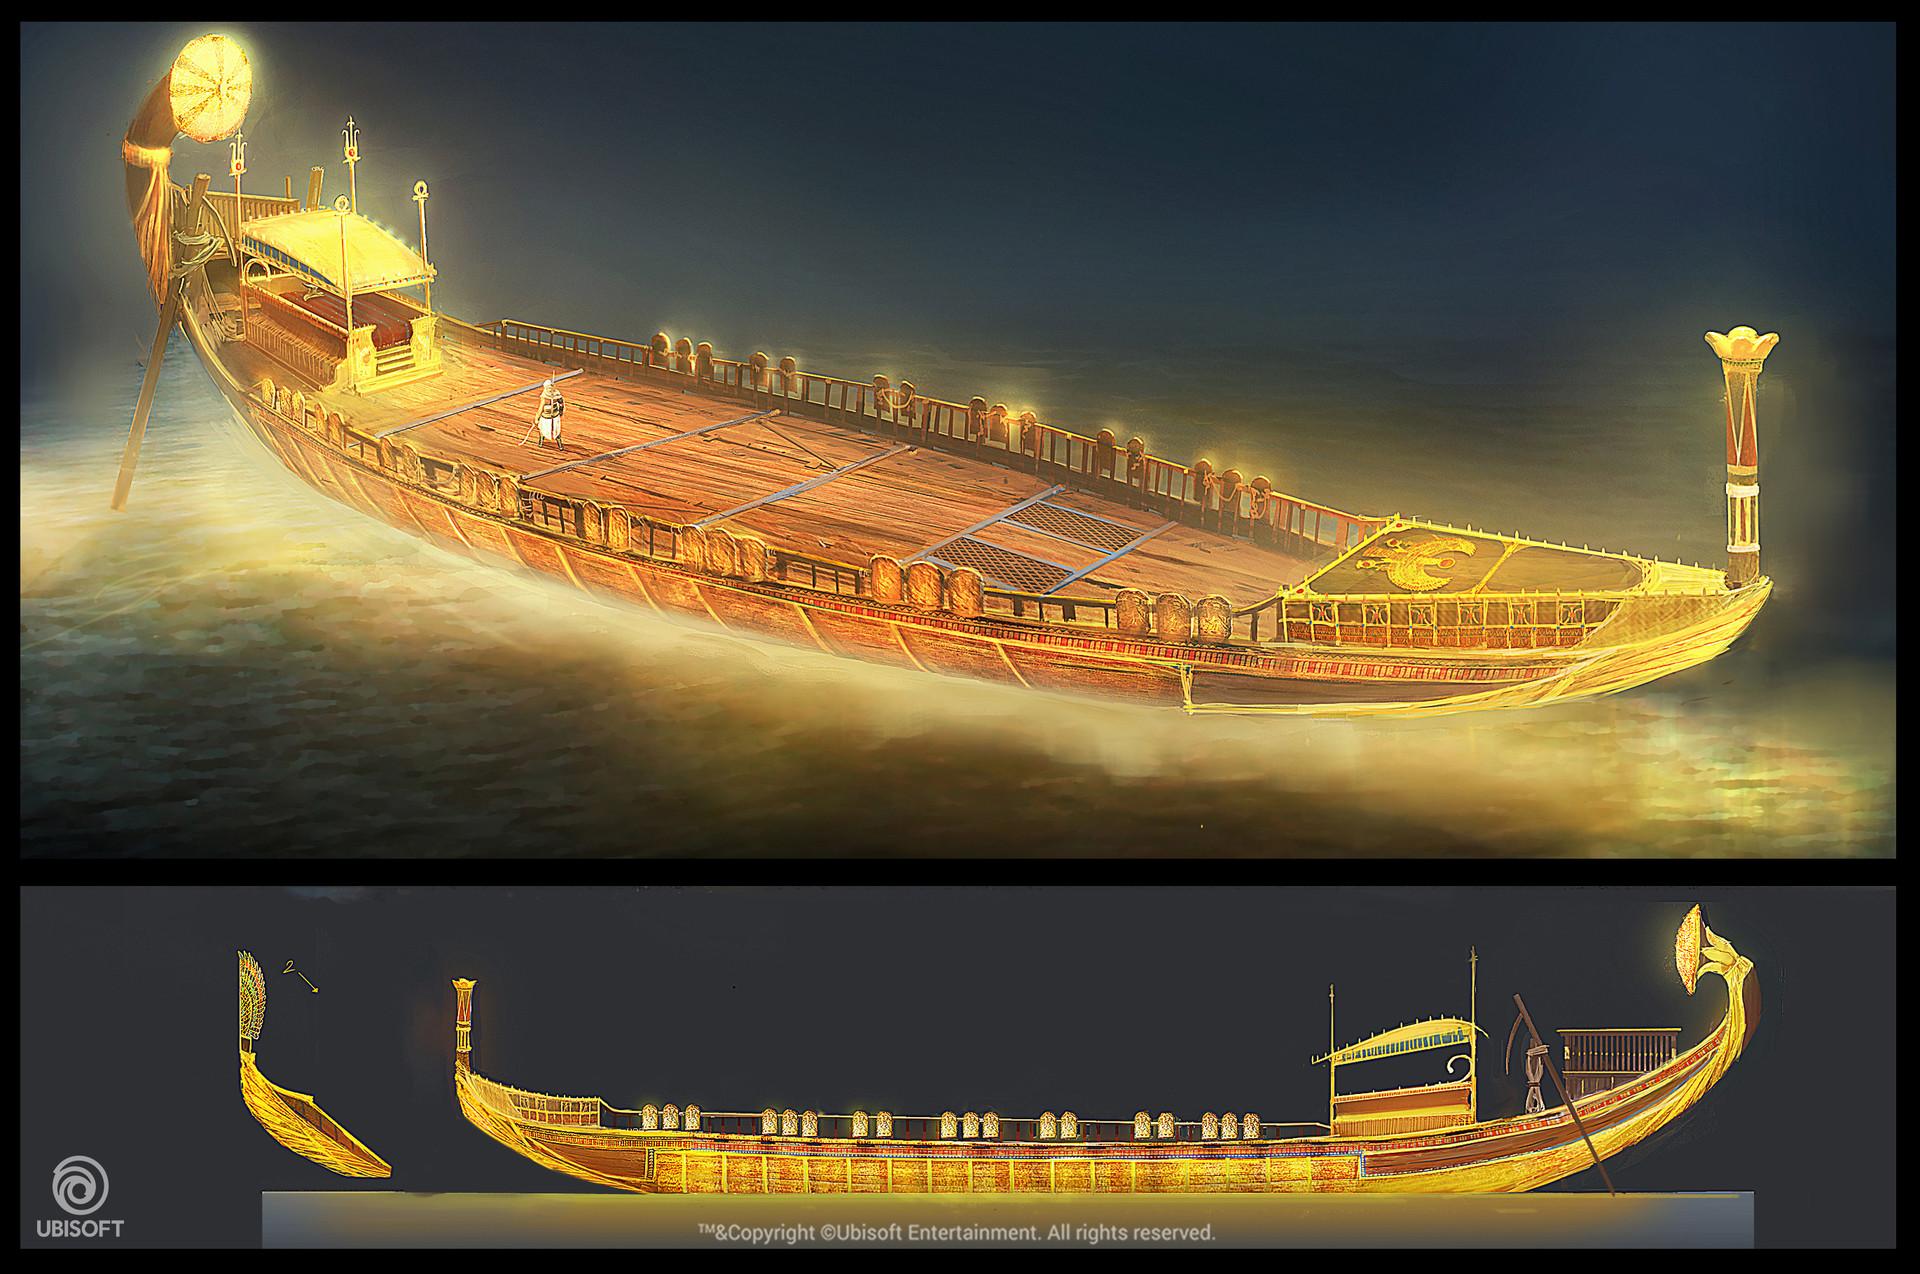 Tsvetelin krastev ace vhl egs boat of ra 01a tsvetelinkrastev